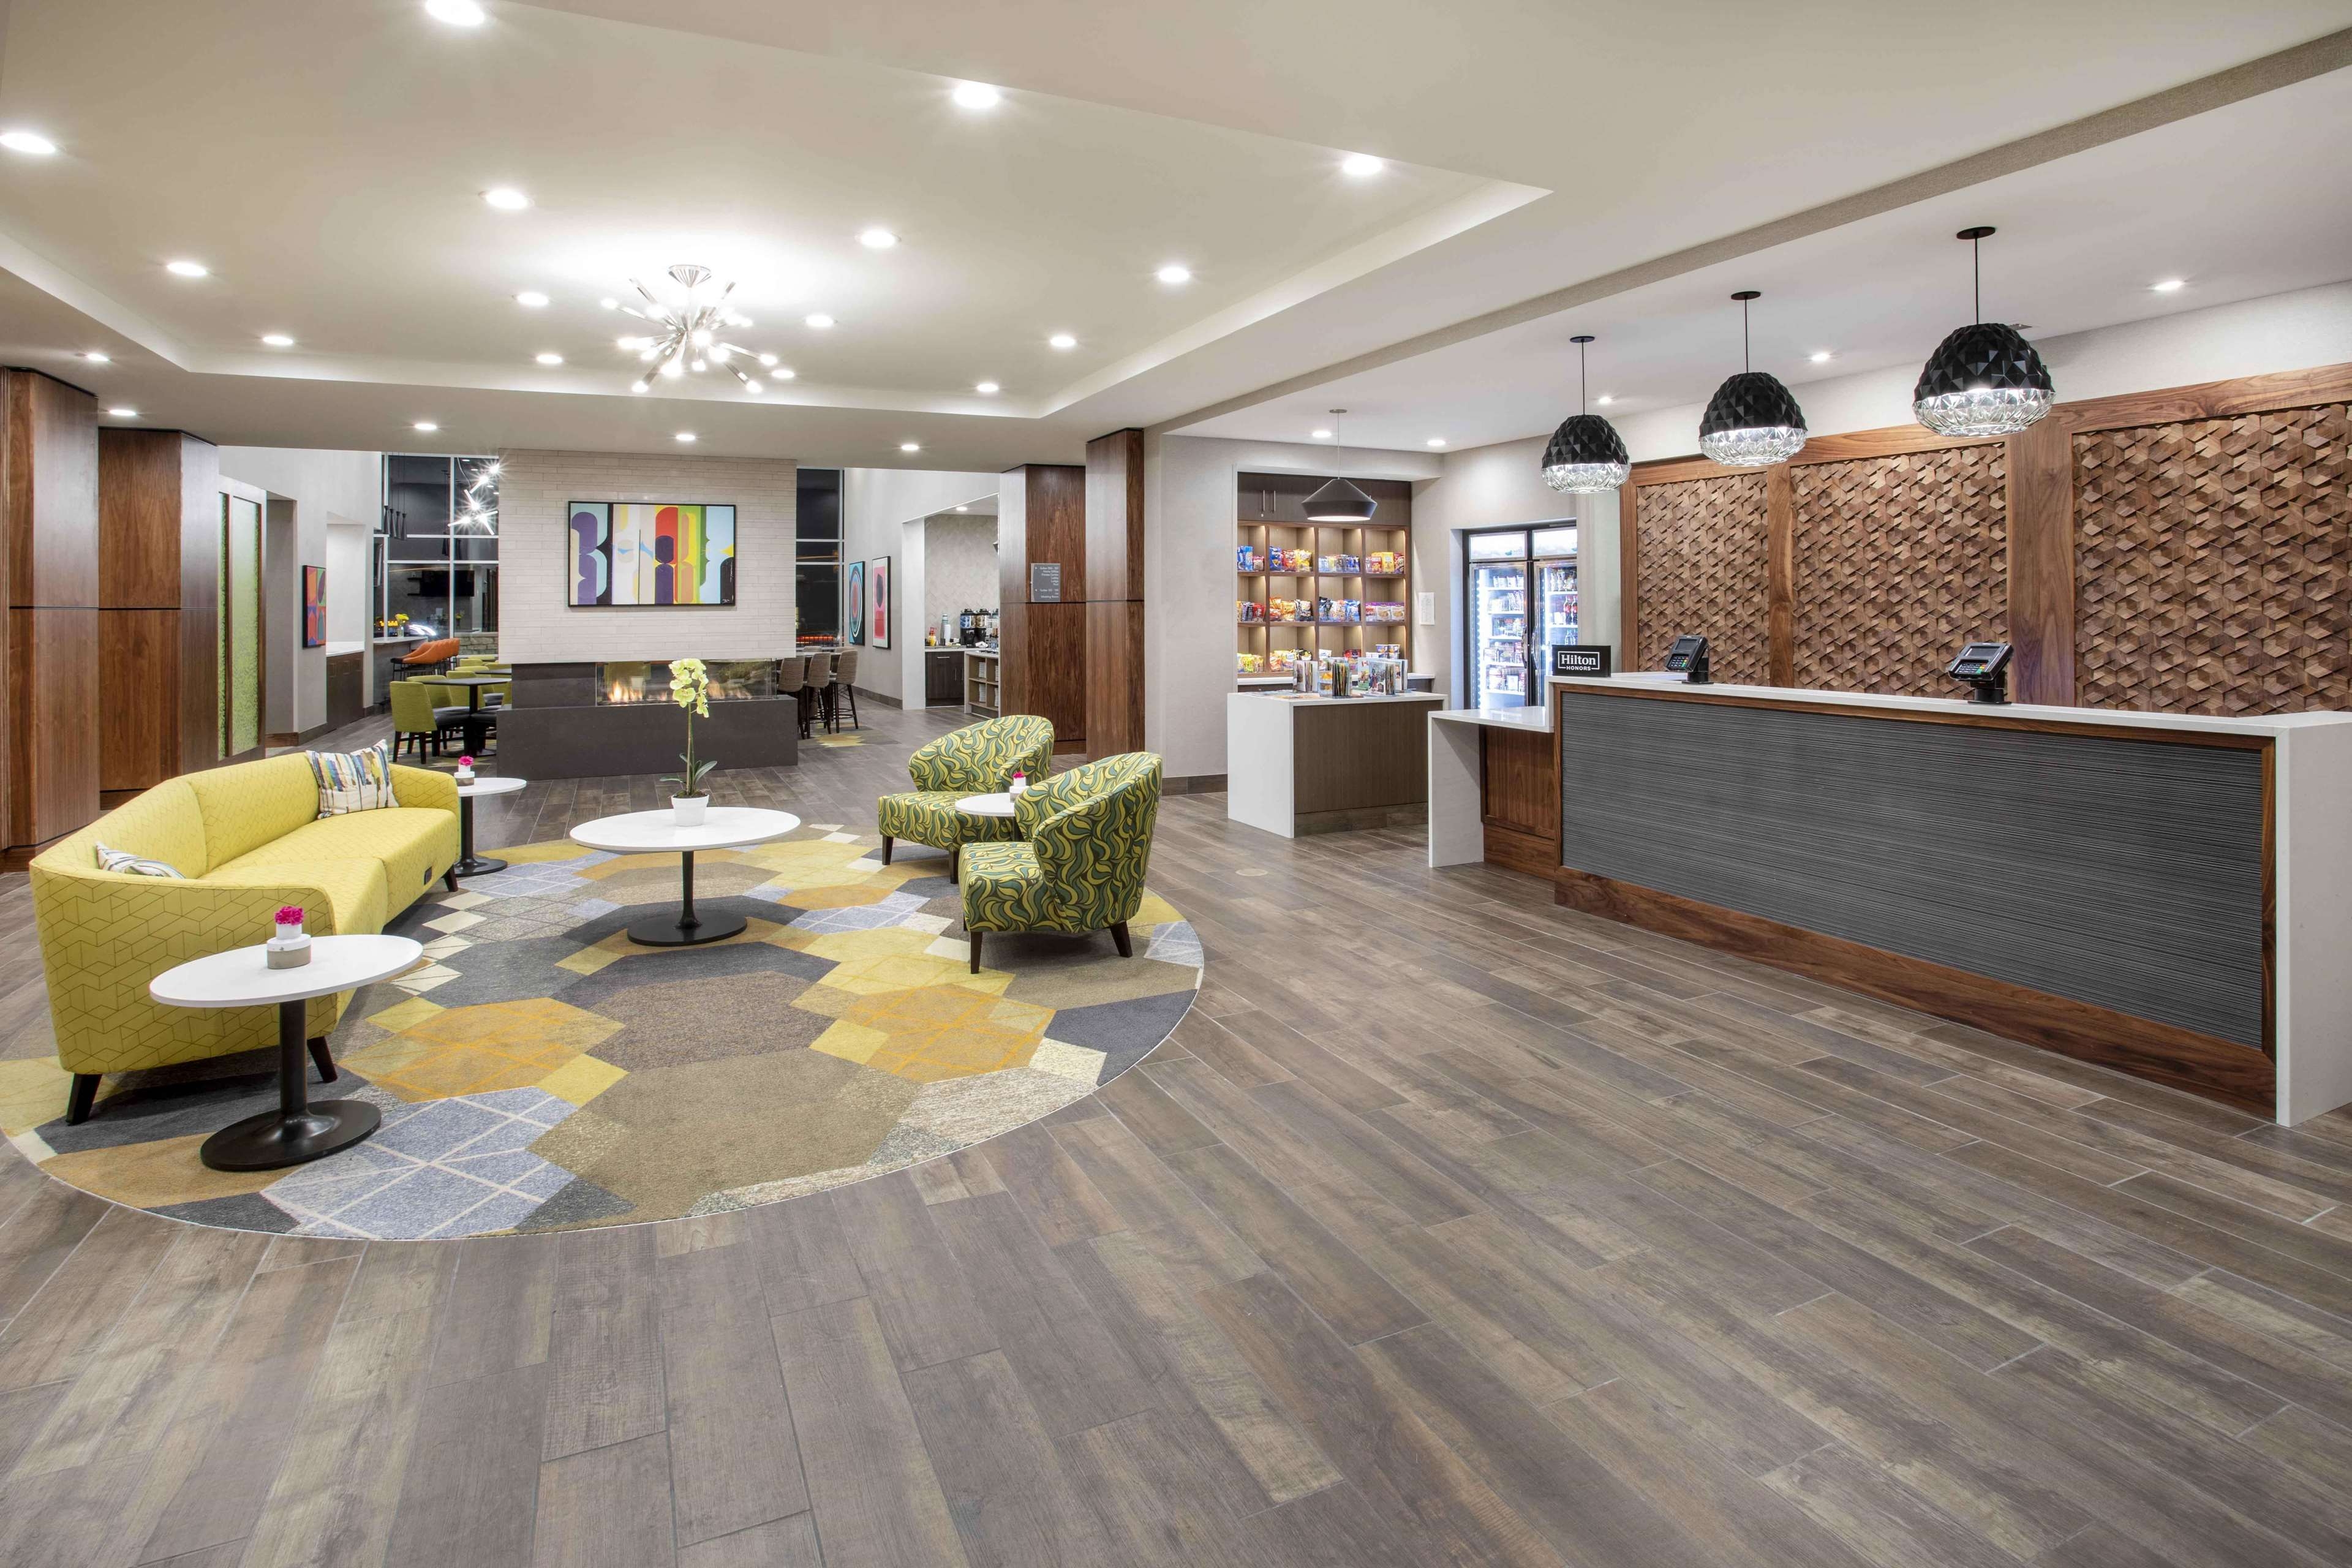 Homewood Suites by Hilton Edina Minneapolis image 8